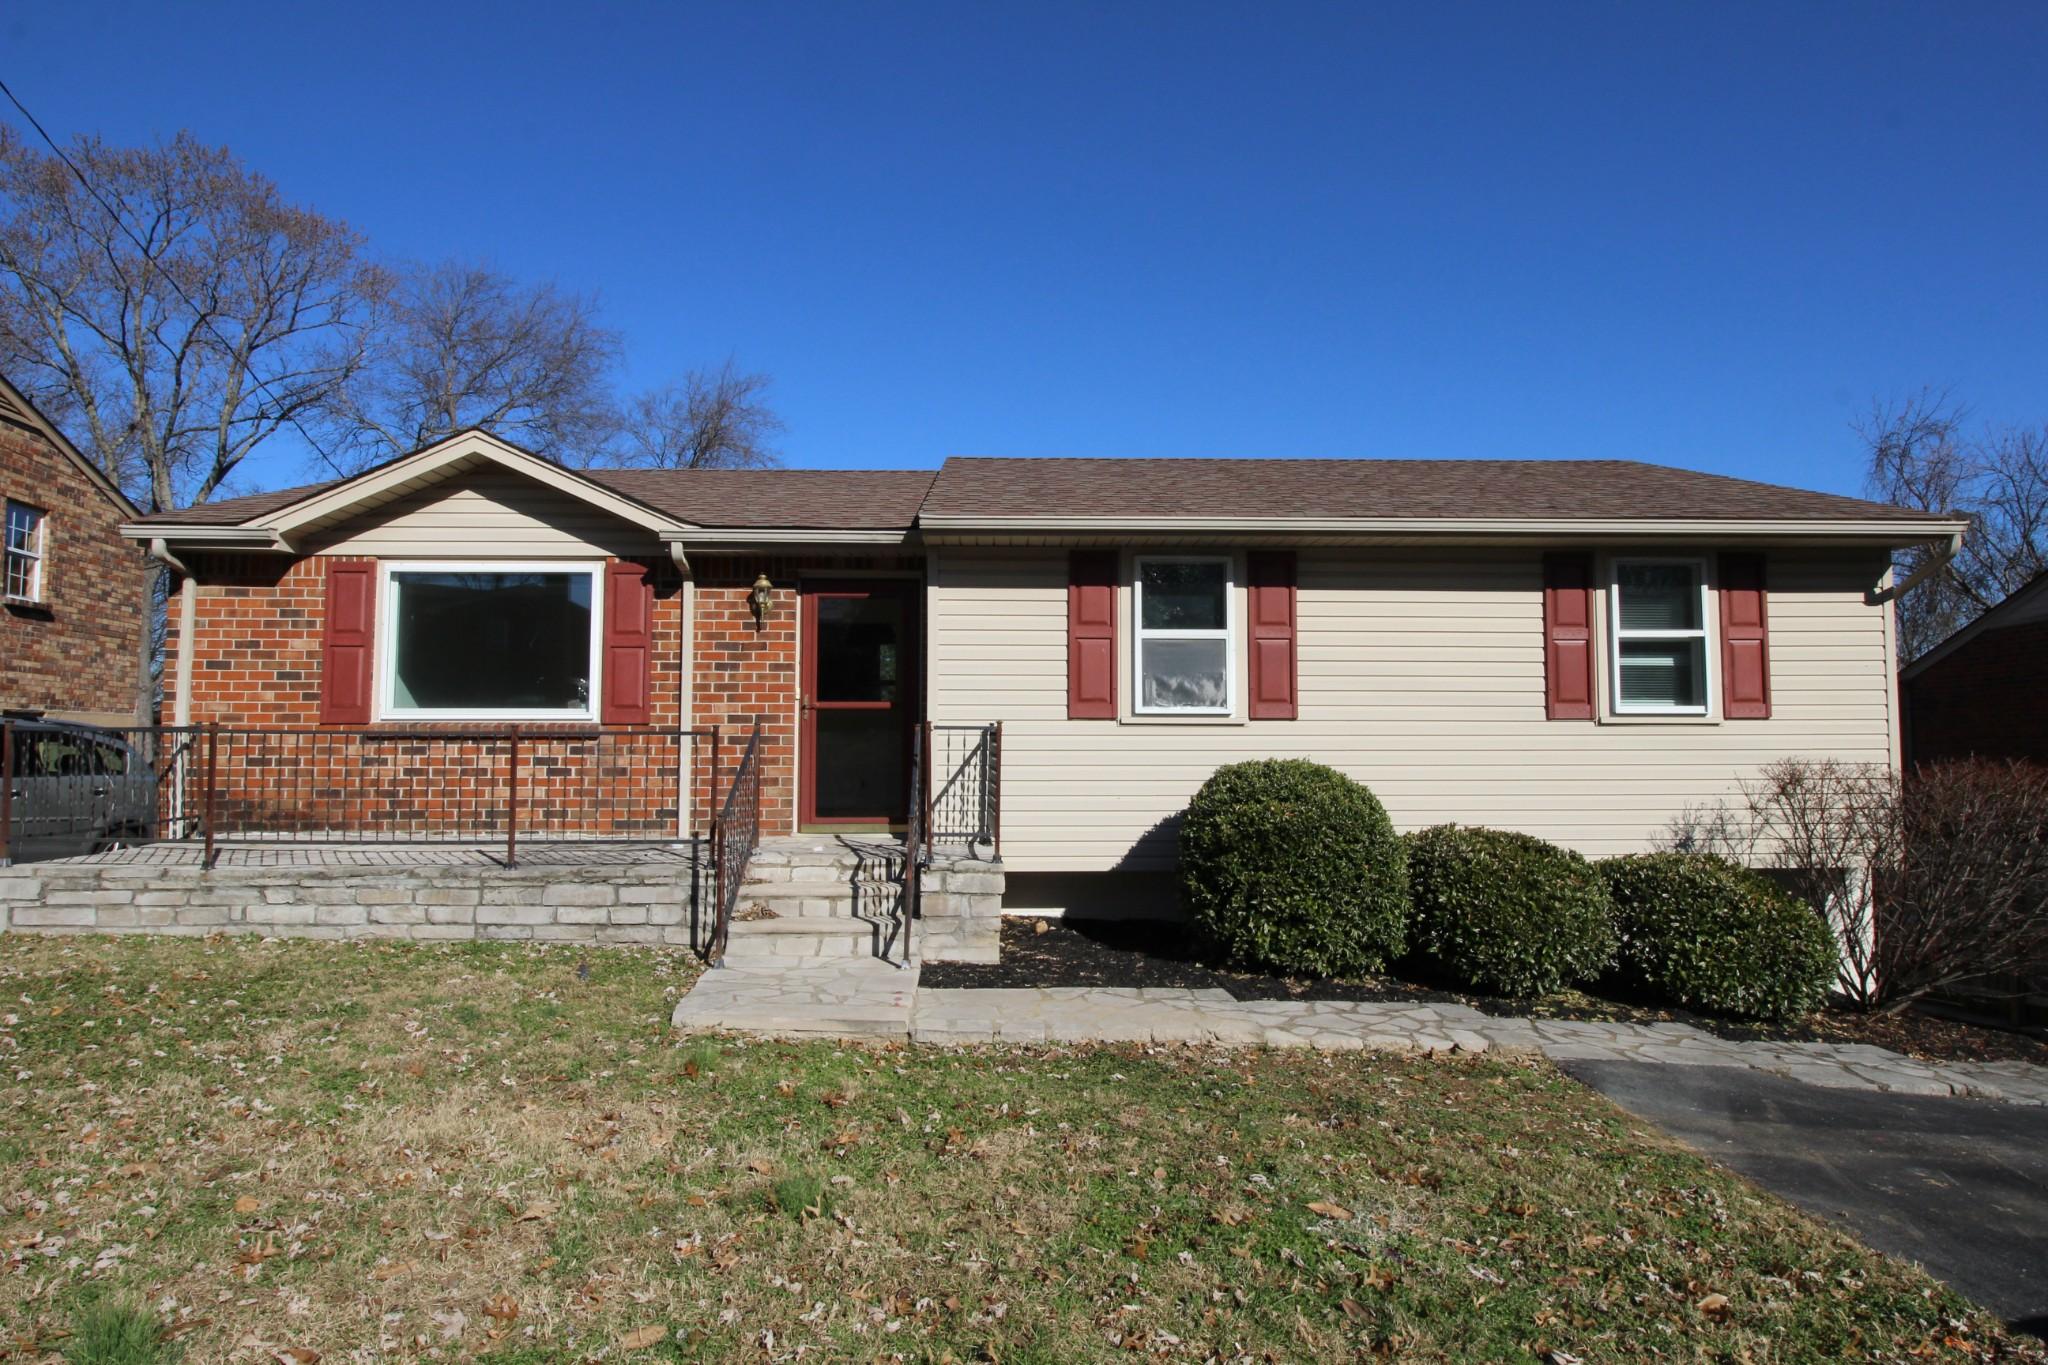 208 Manatee Ct, Antioch, TN 37013 - Antioch, TN real estate listing